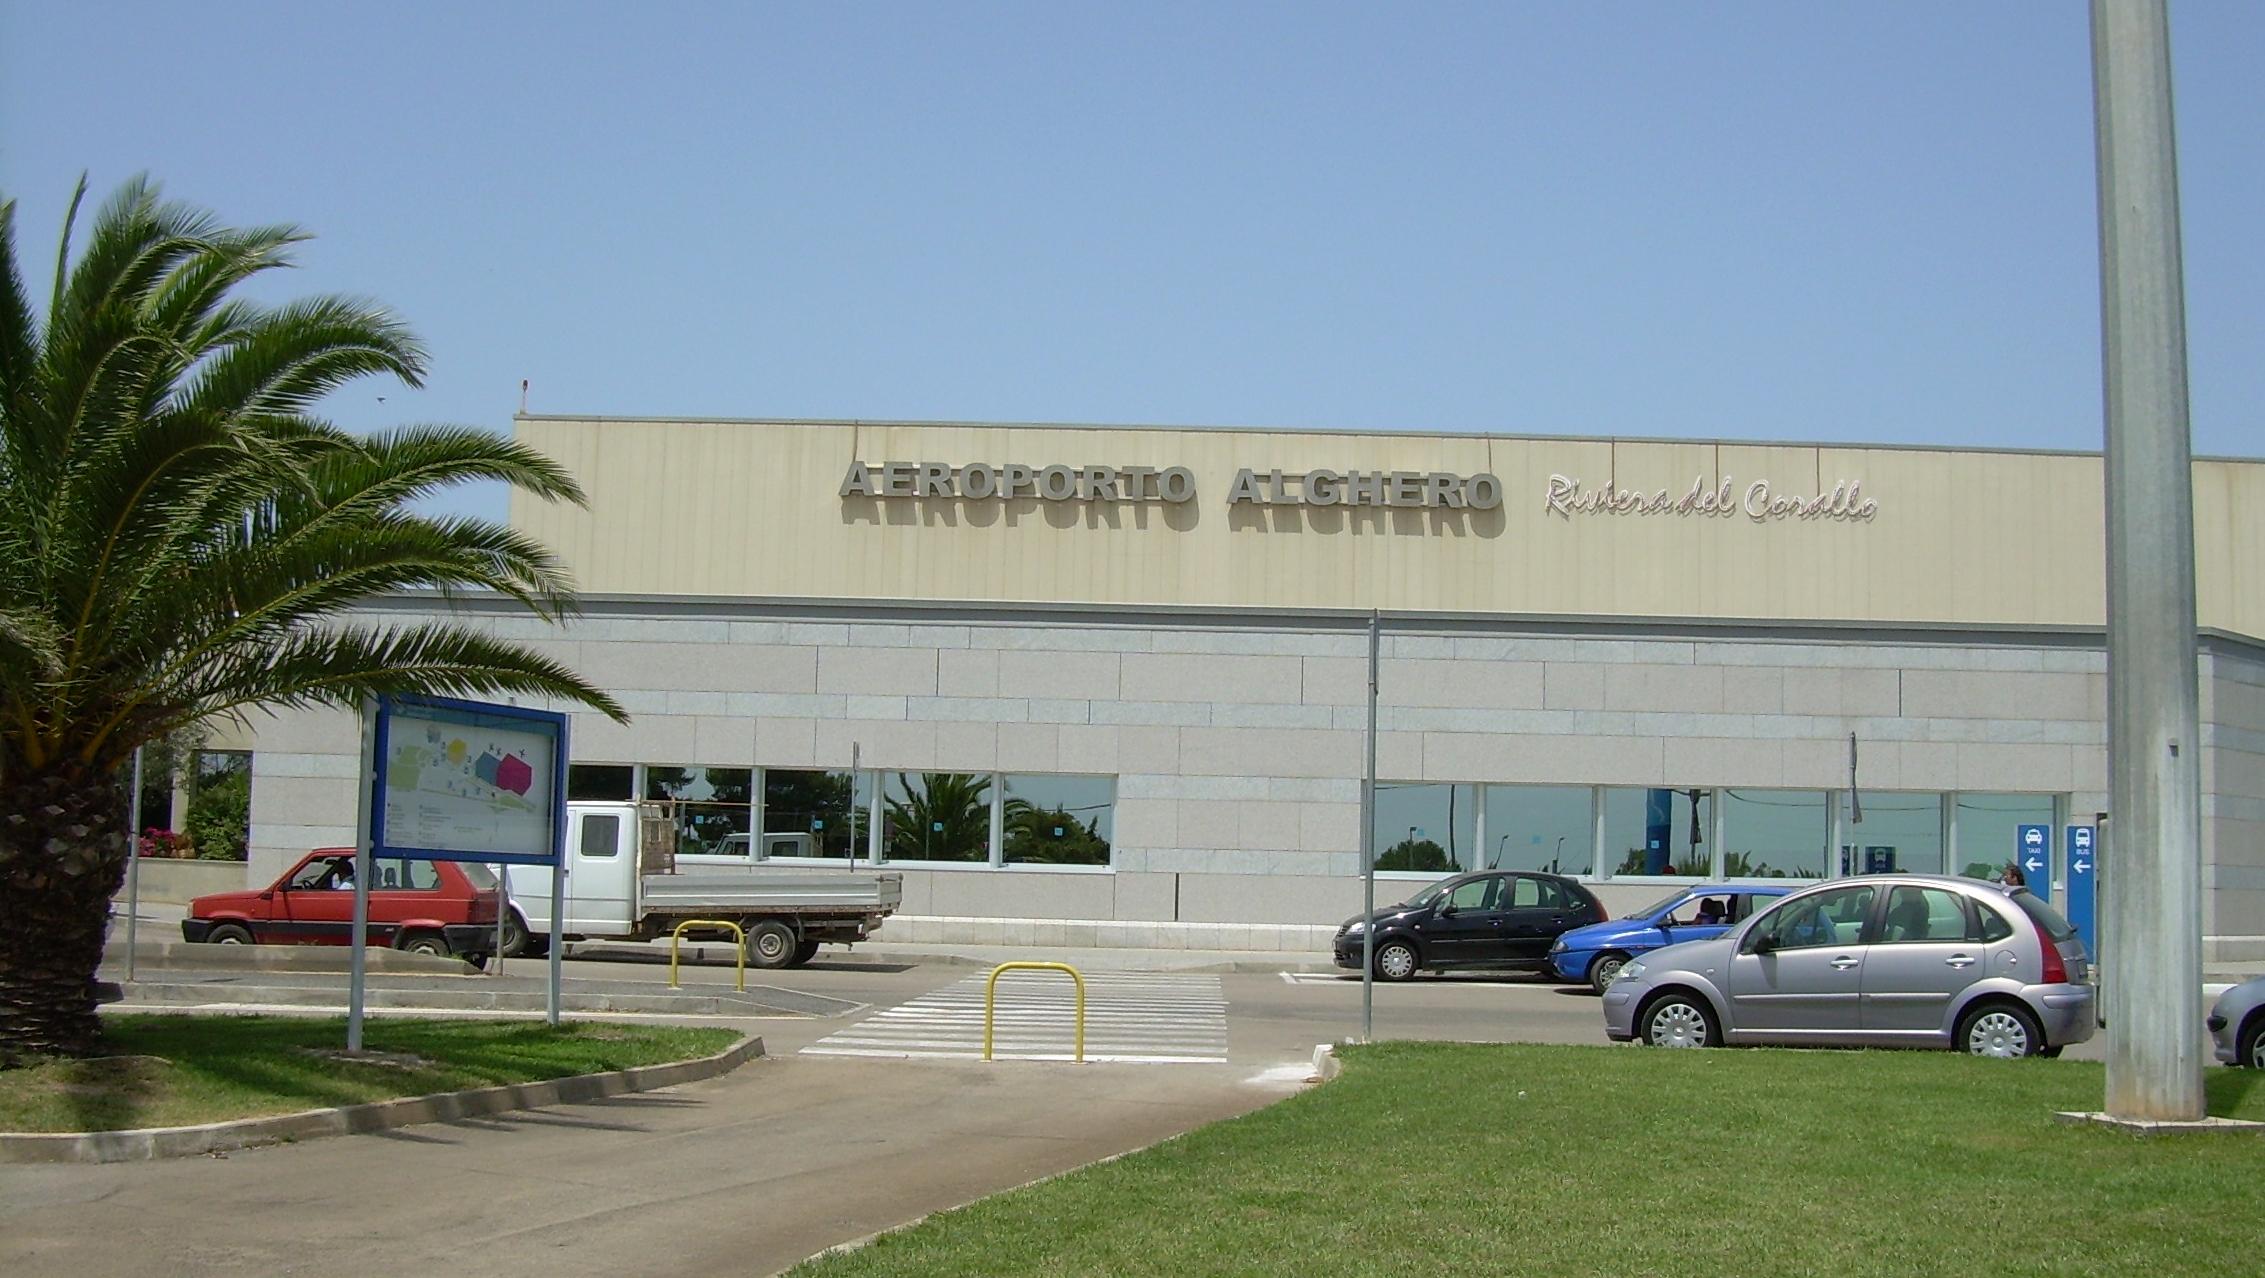 alghero lufthavn